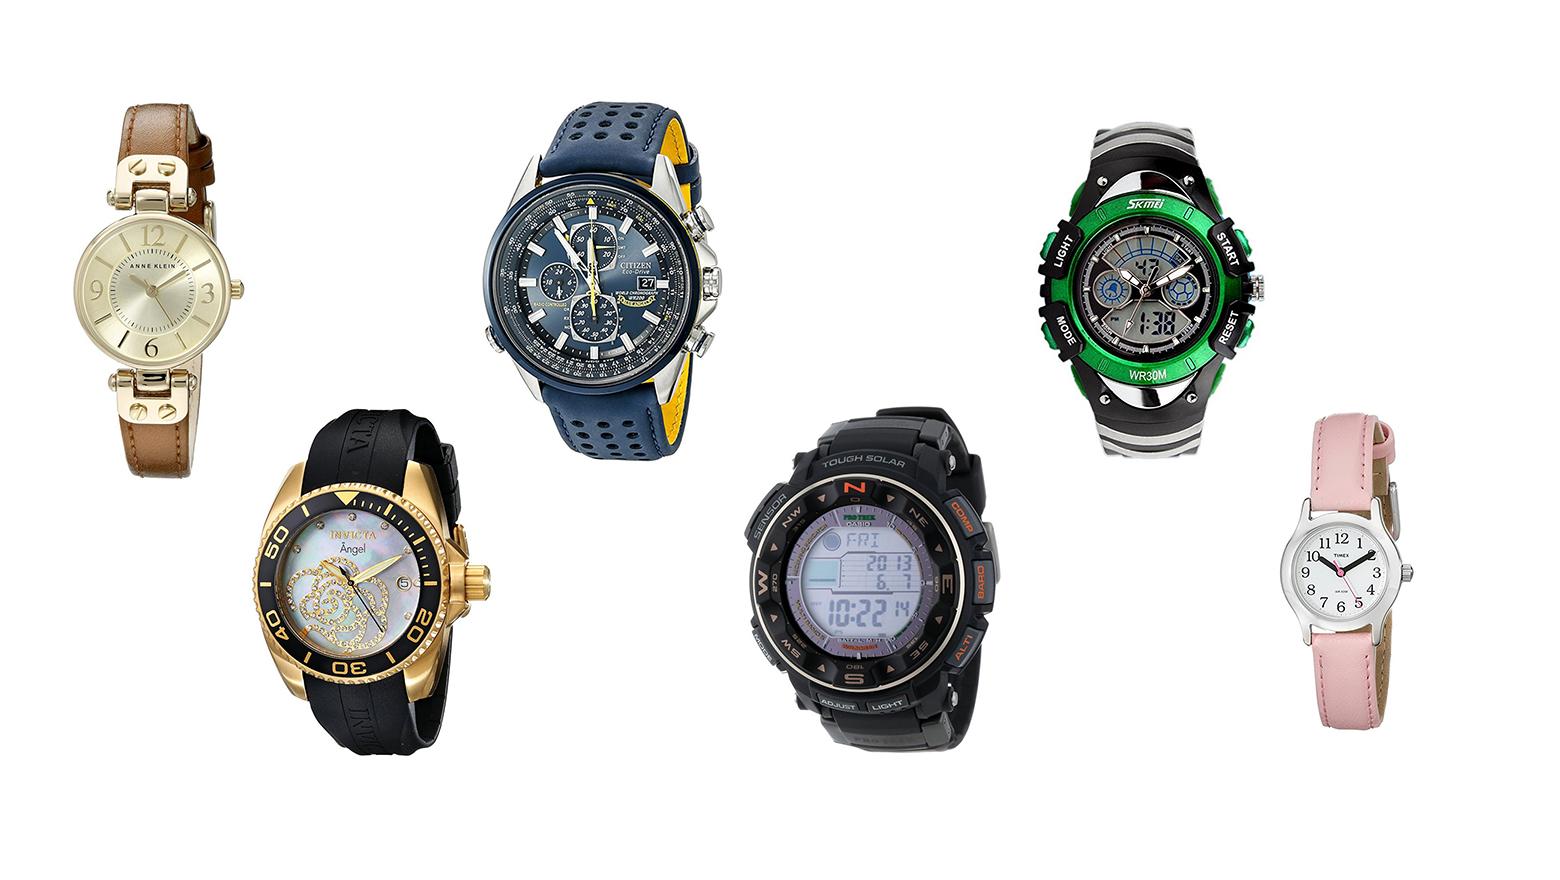 Amazon, cyber monday, cyber monday sales, cyber Monday, watches, kids watches, womens watches, mens watches